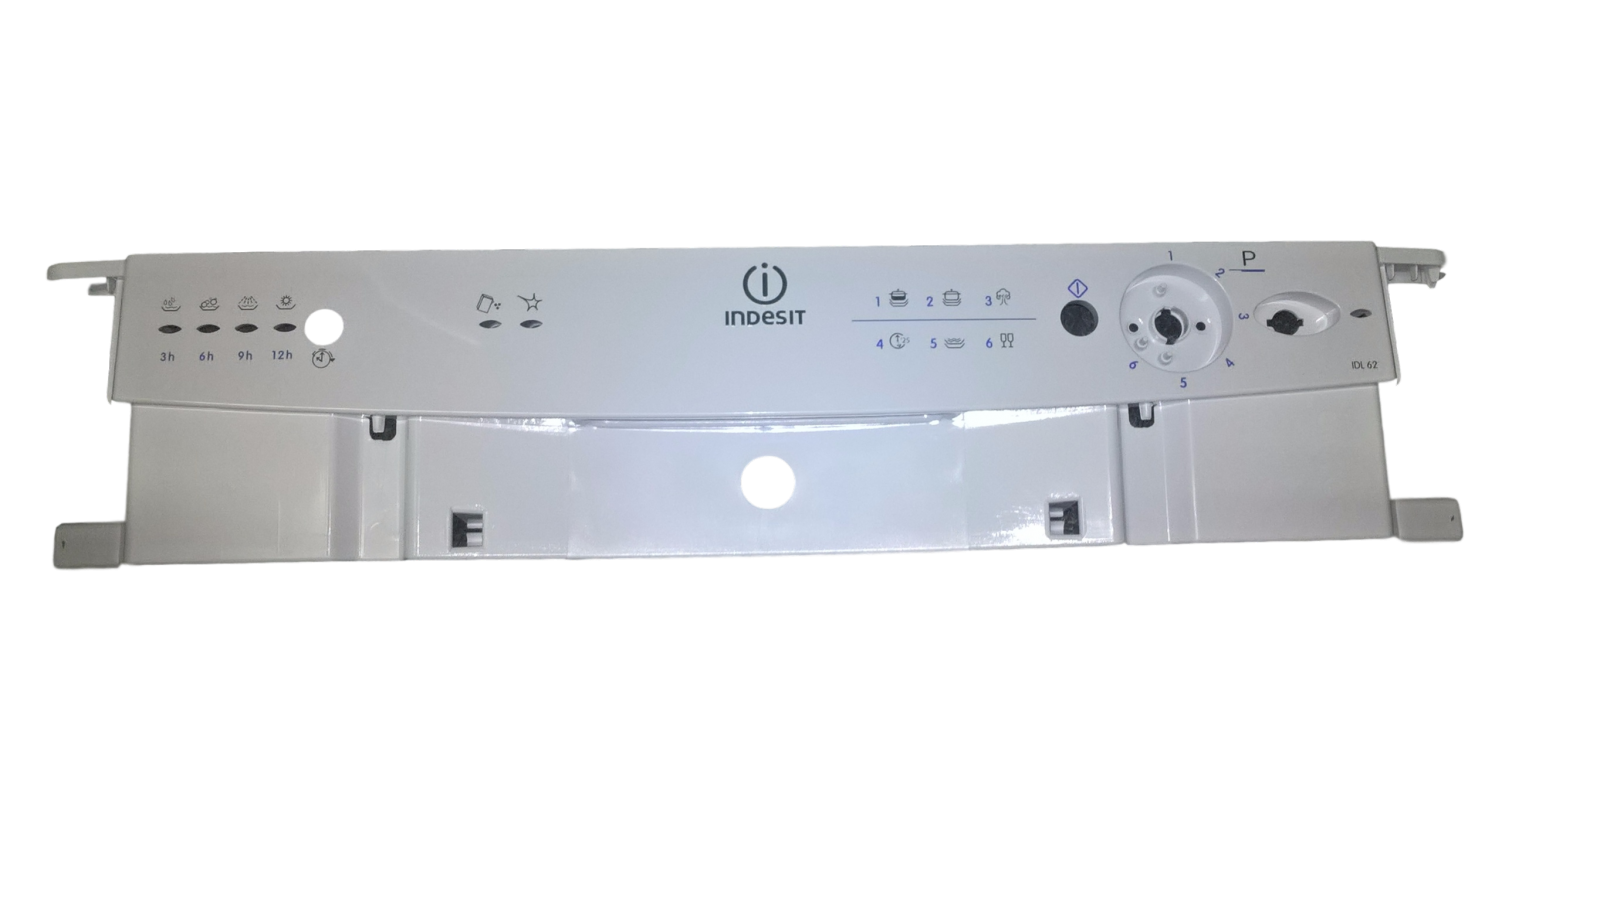 panel ovládací pro myčku Indesit - C00144089 Whirlpool / Indesit